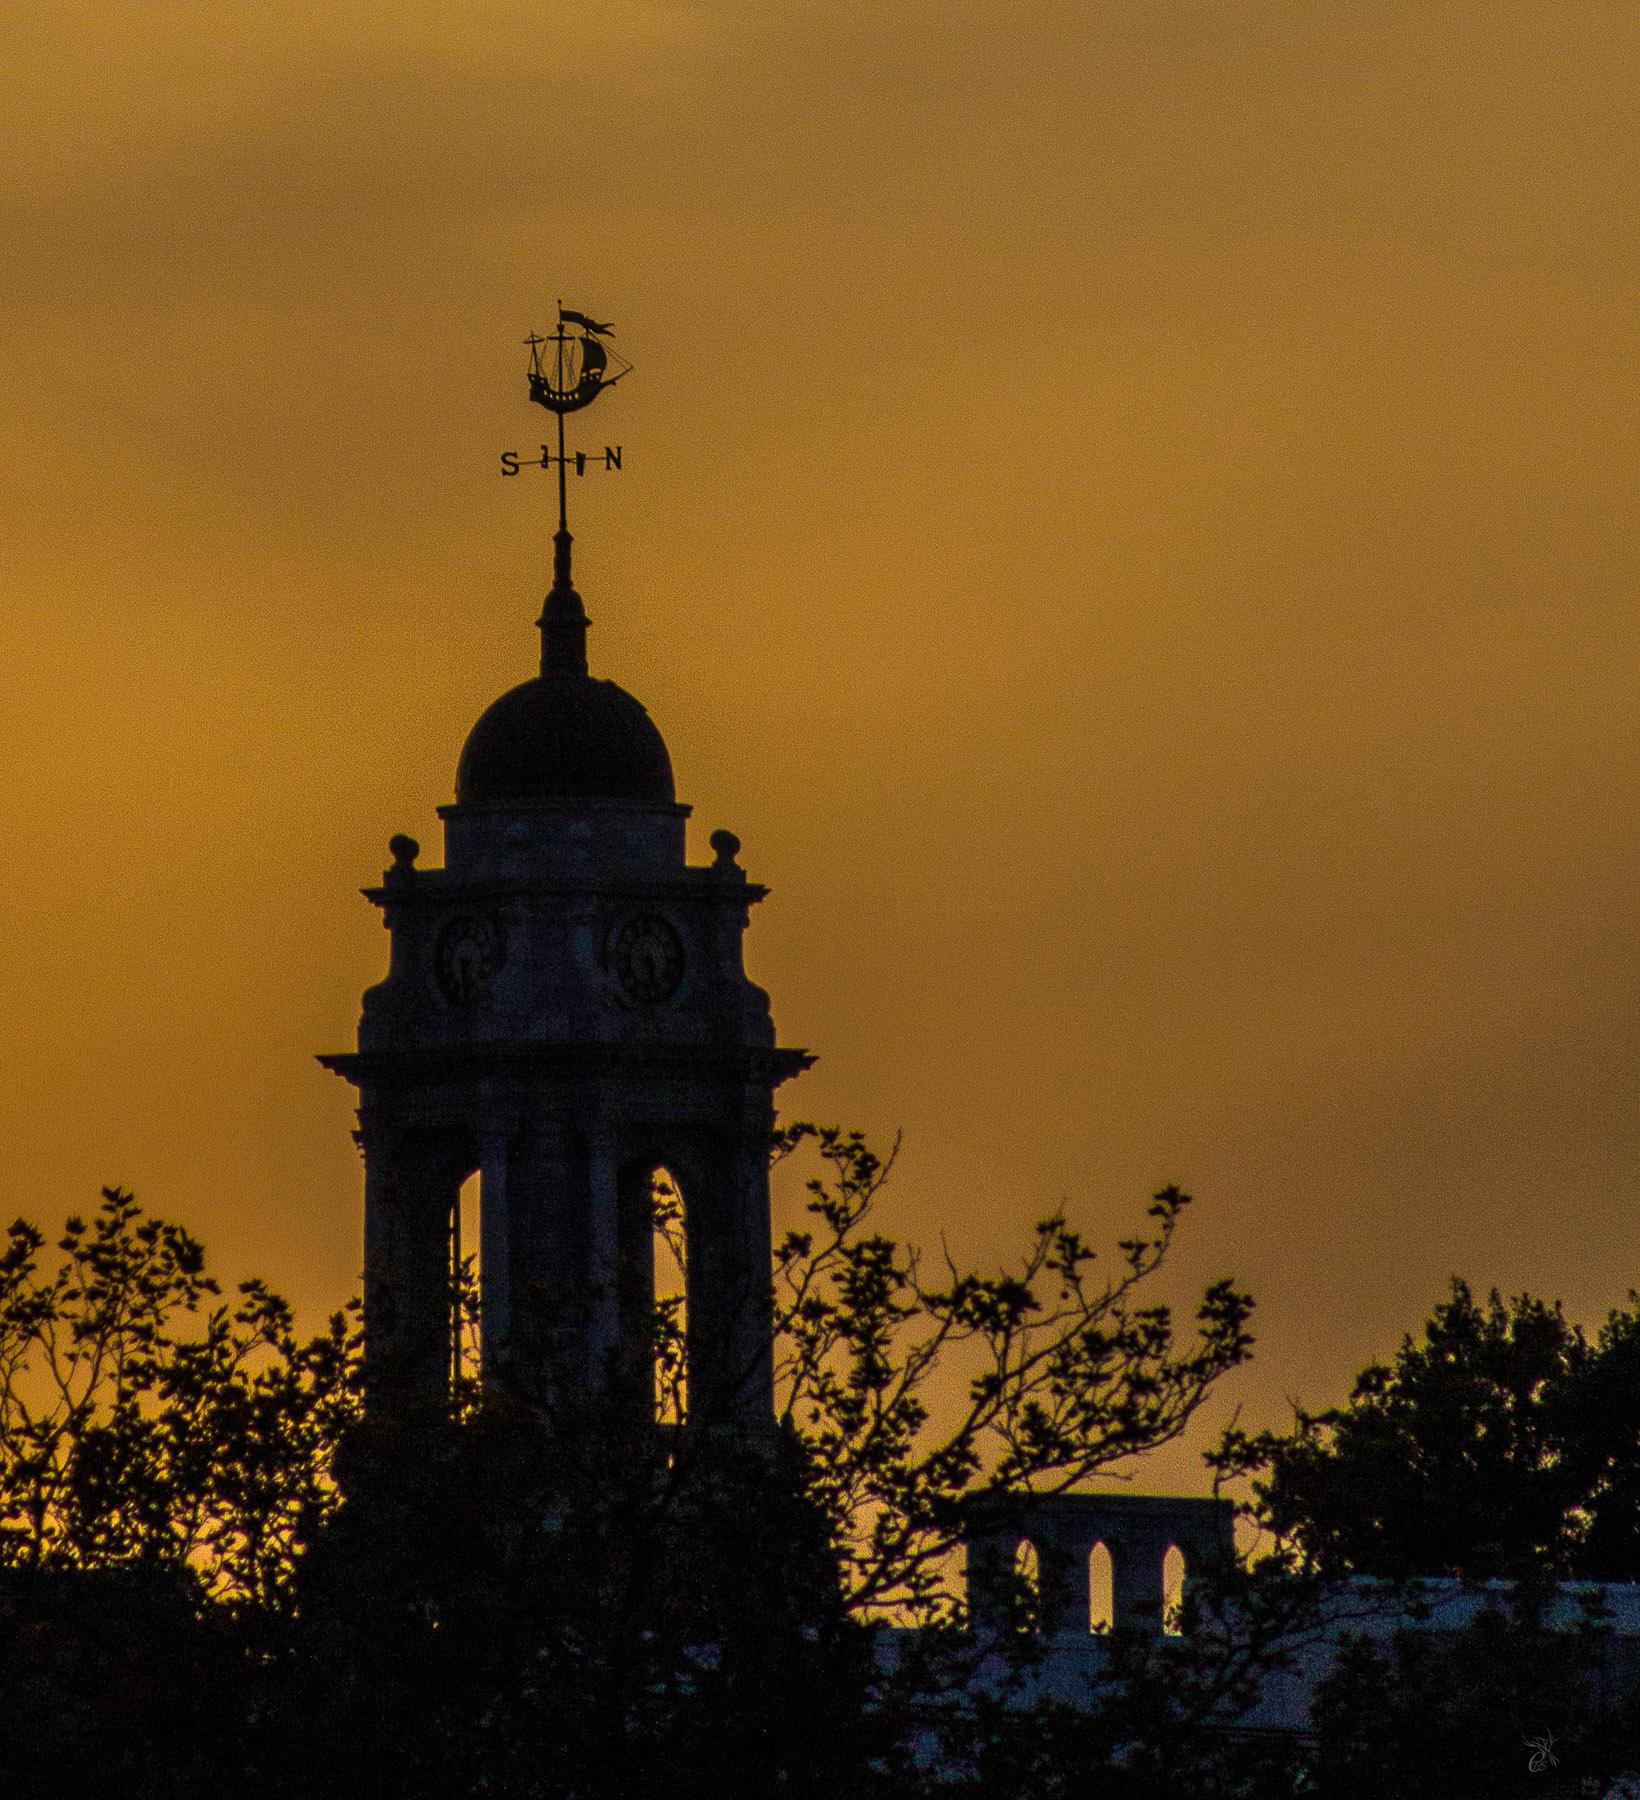 City Hall Weathervane Silhouette